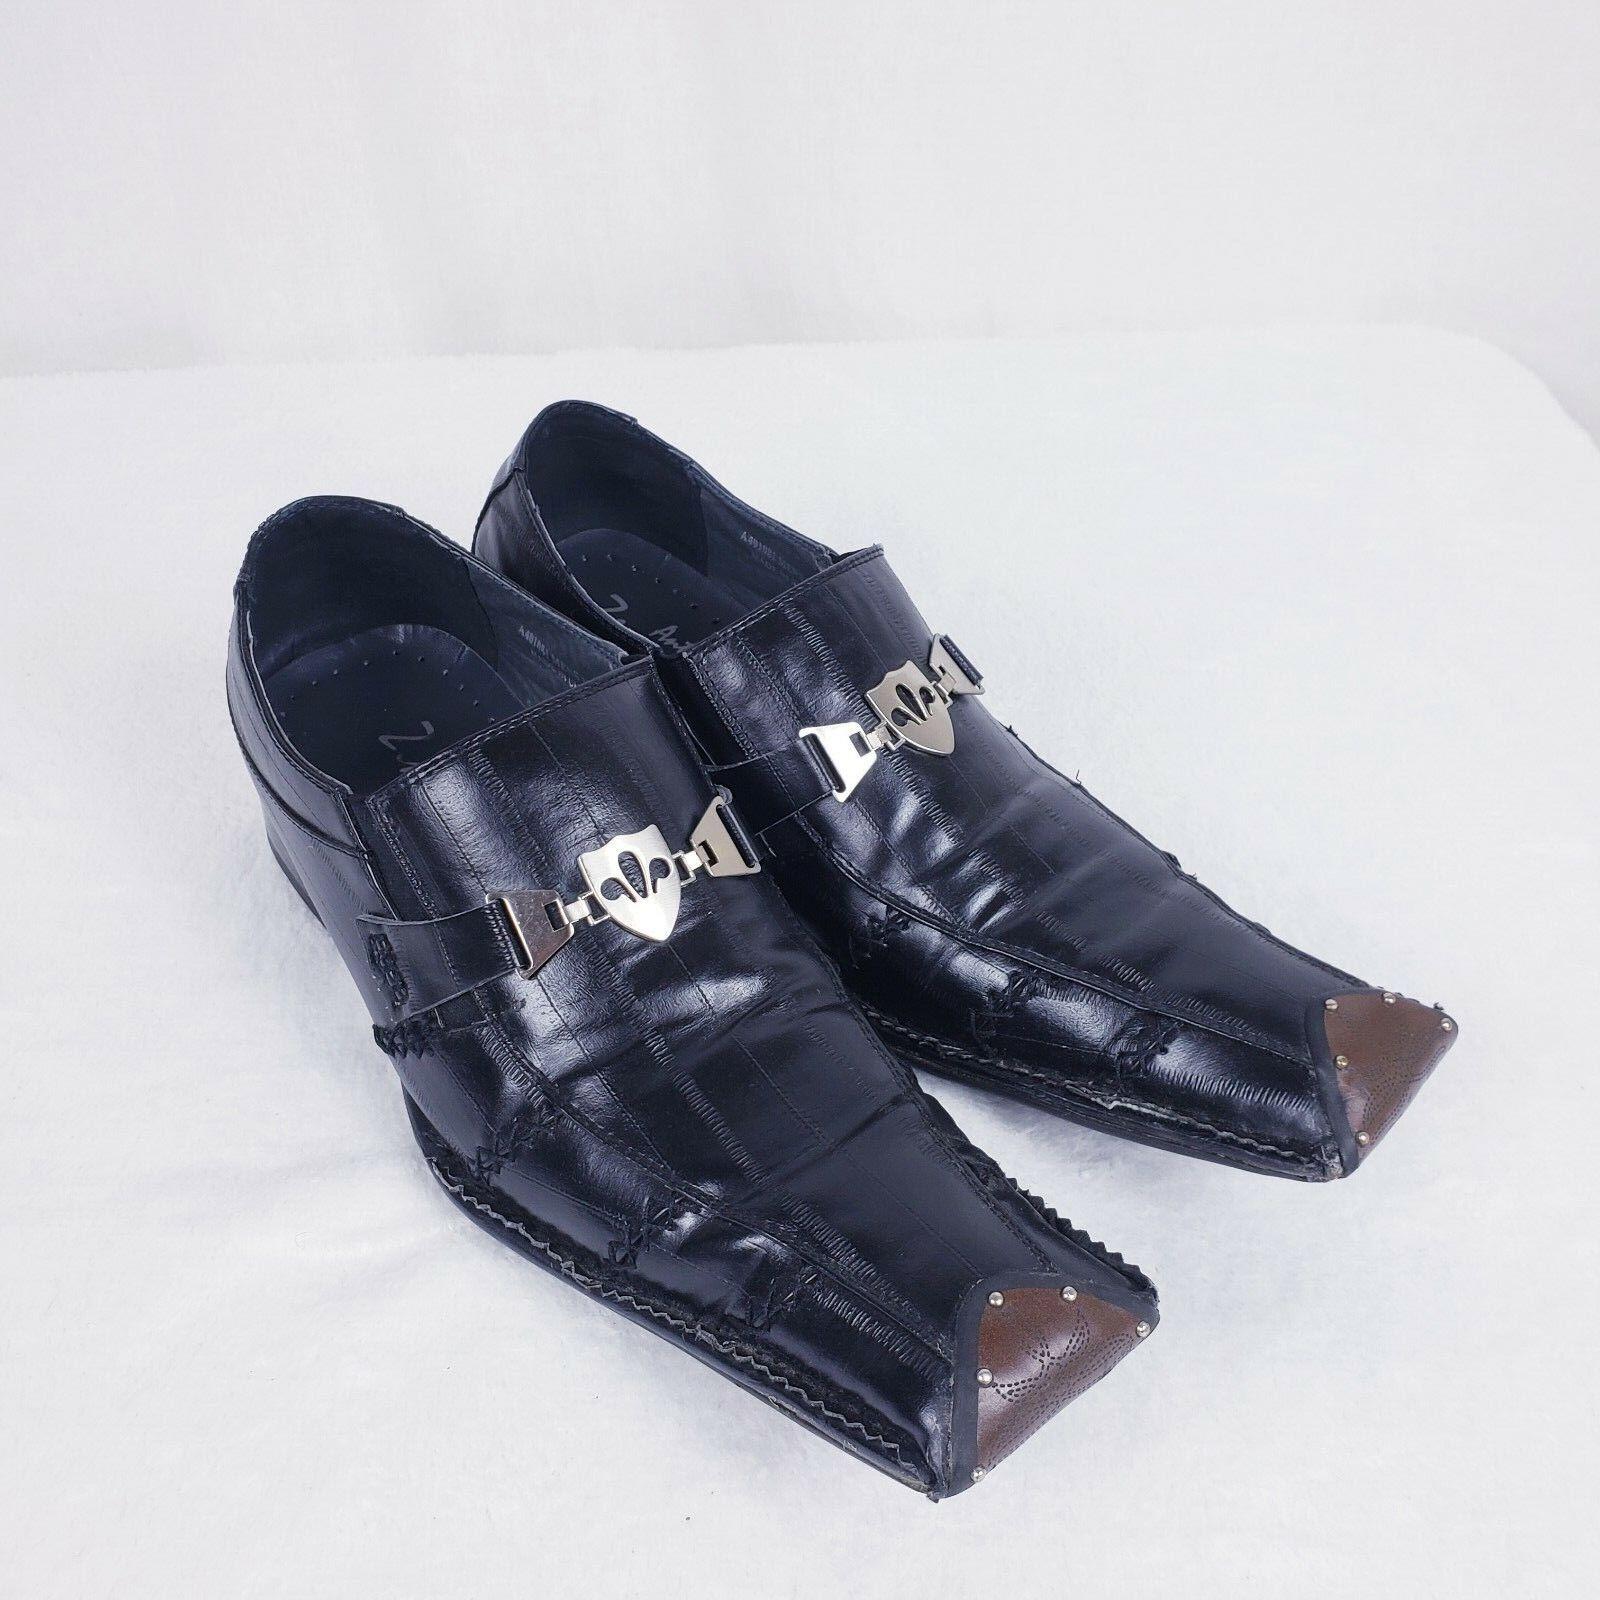 Antonio Zengara Sz 10 M Slip On Black Leather shoes Studs Square Toe Horse Bit